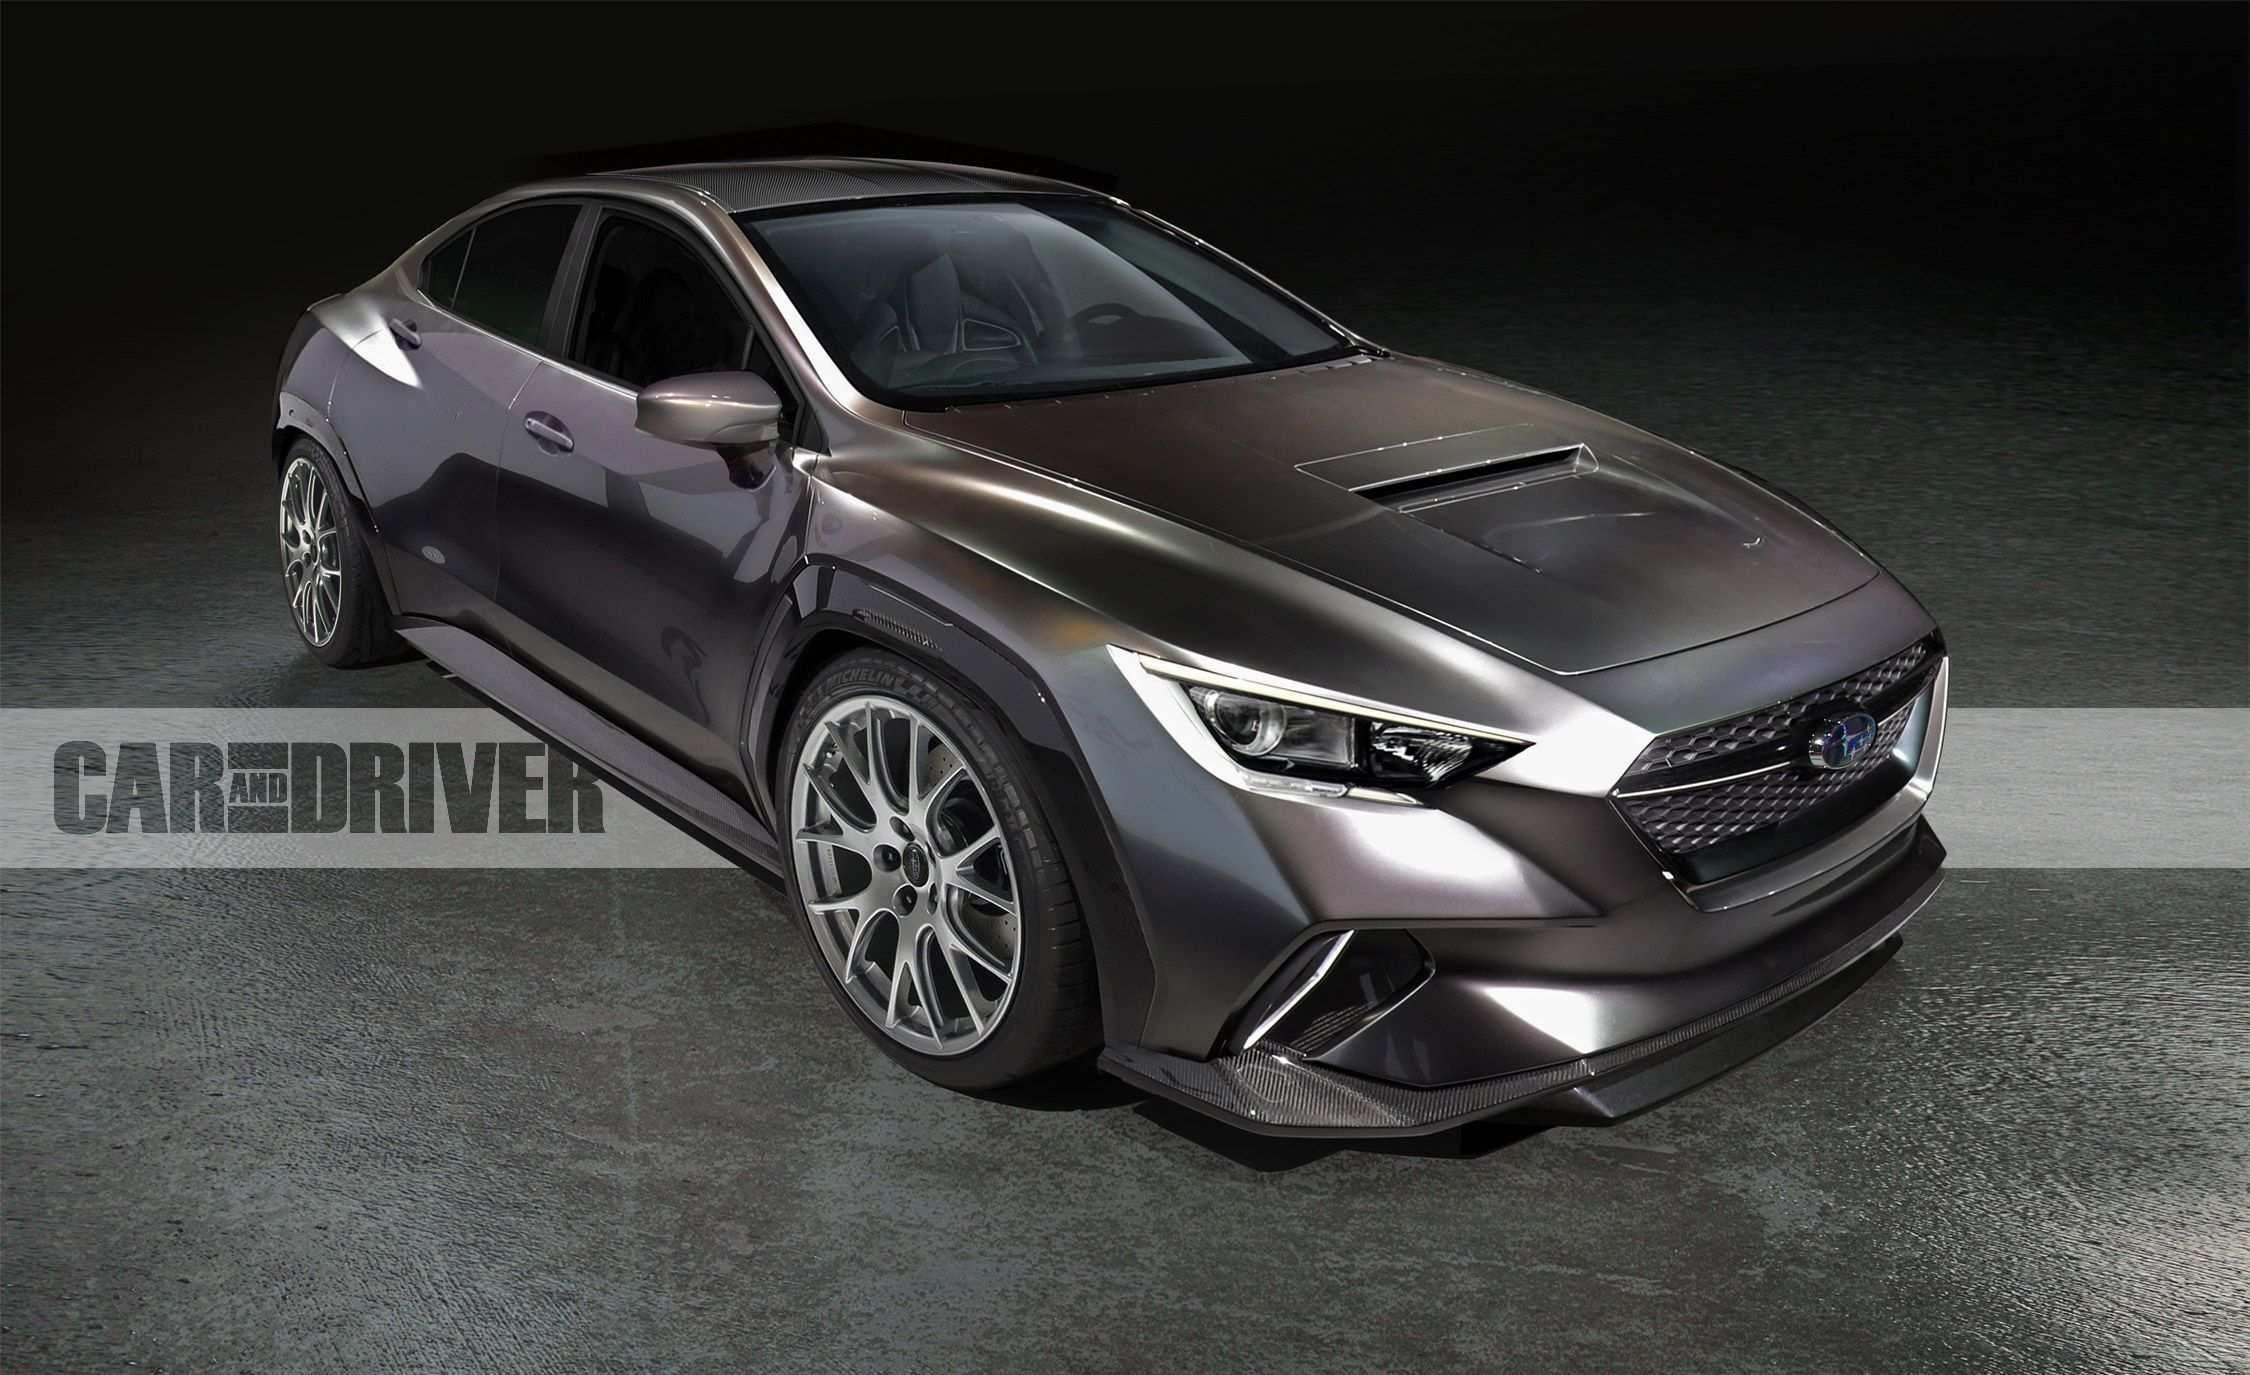 62 New 2020 Subaru Dimensions Spesification by 2020 Subaru Dimensions